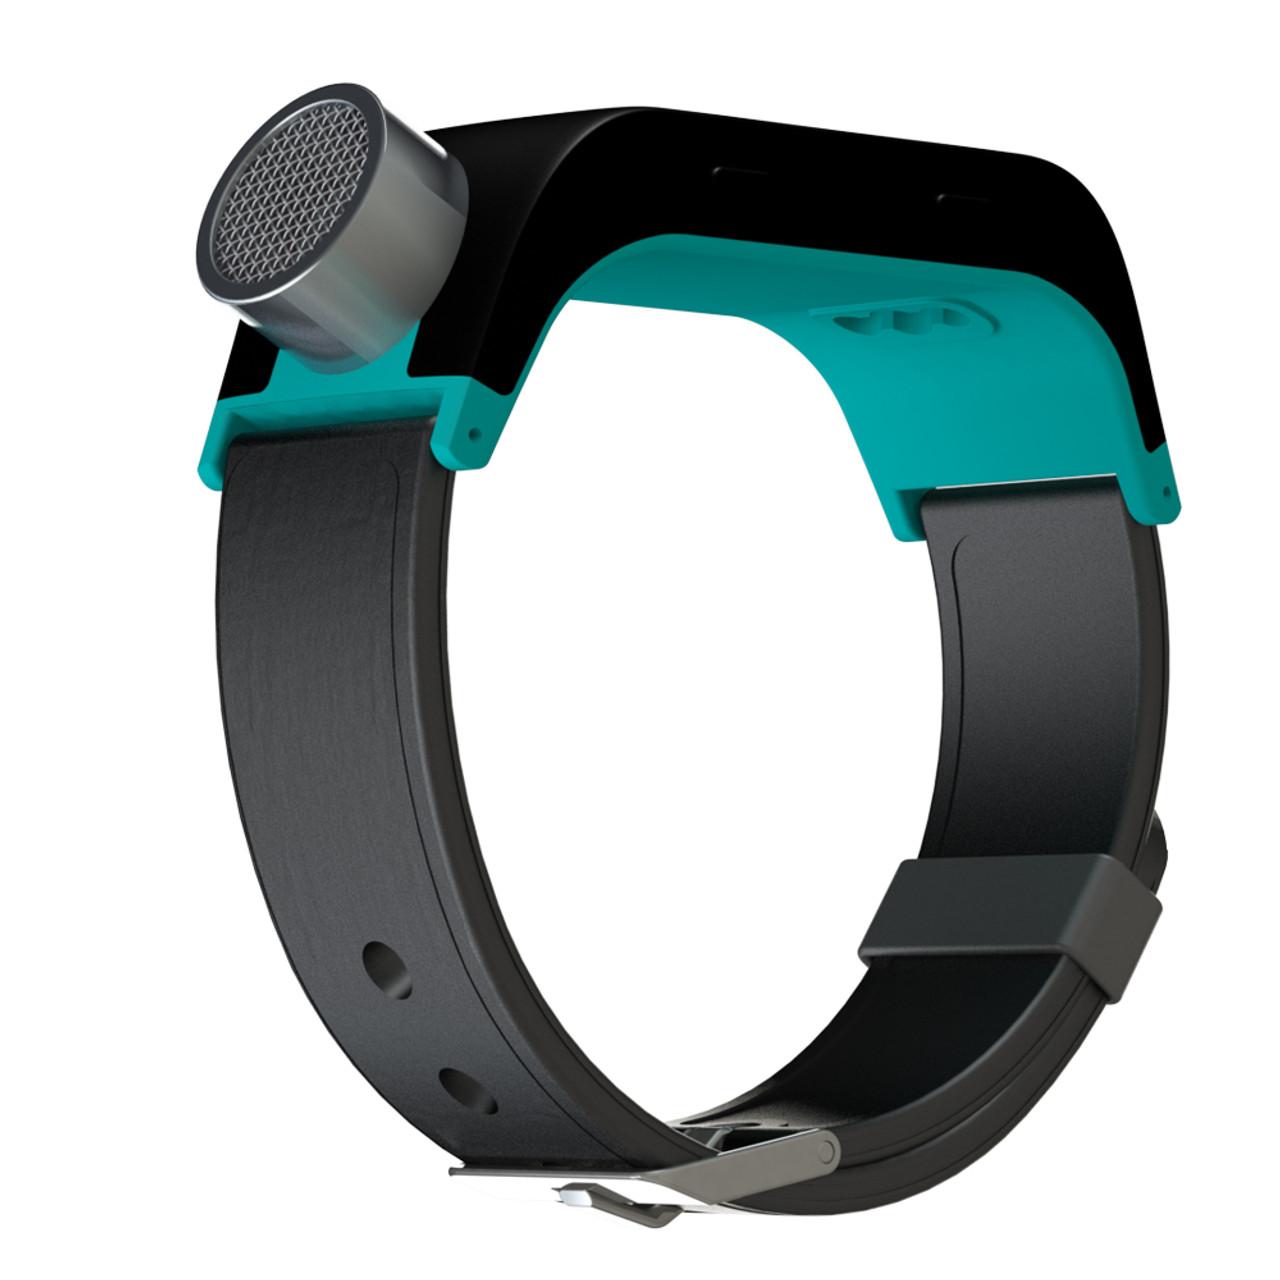 sunu band mobility technology